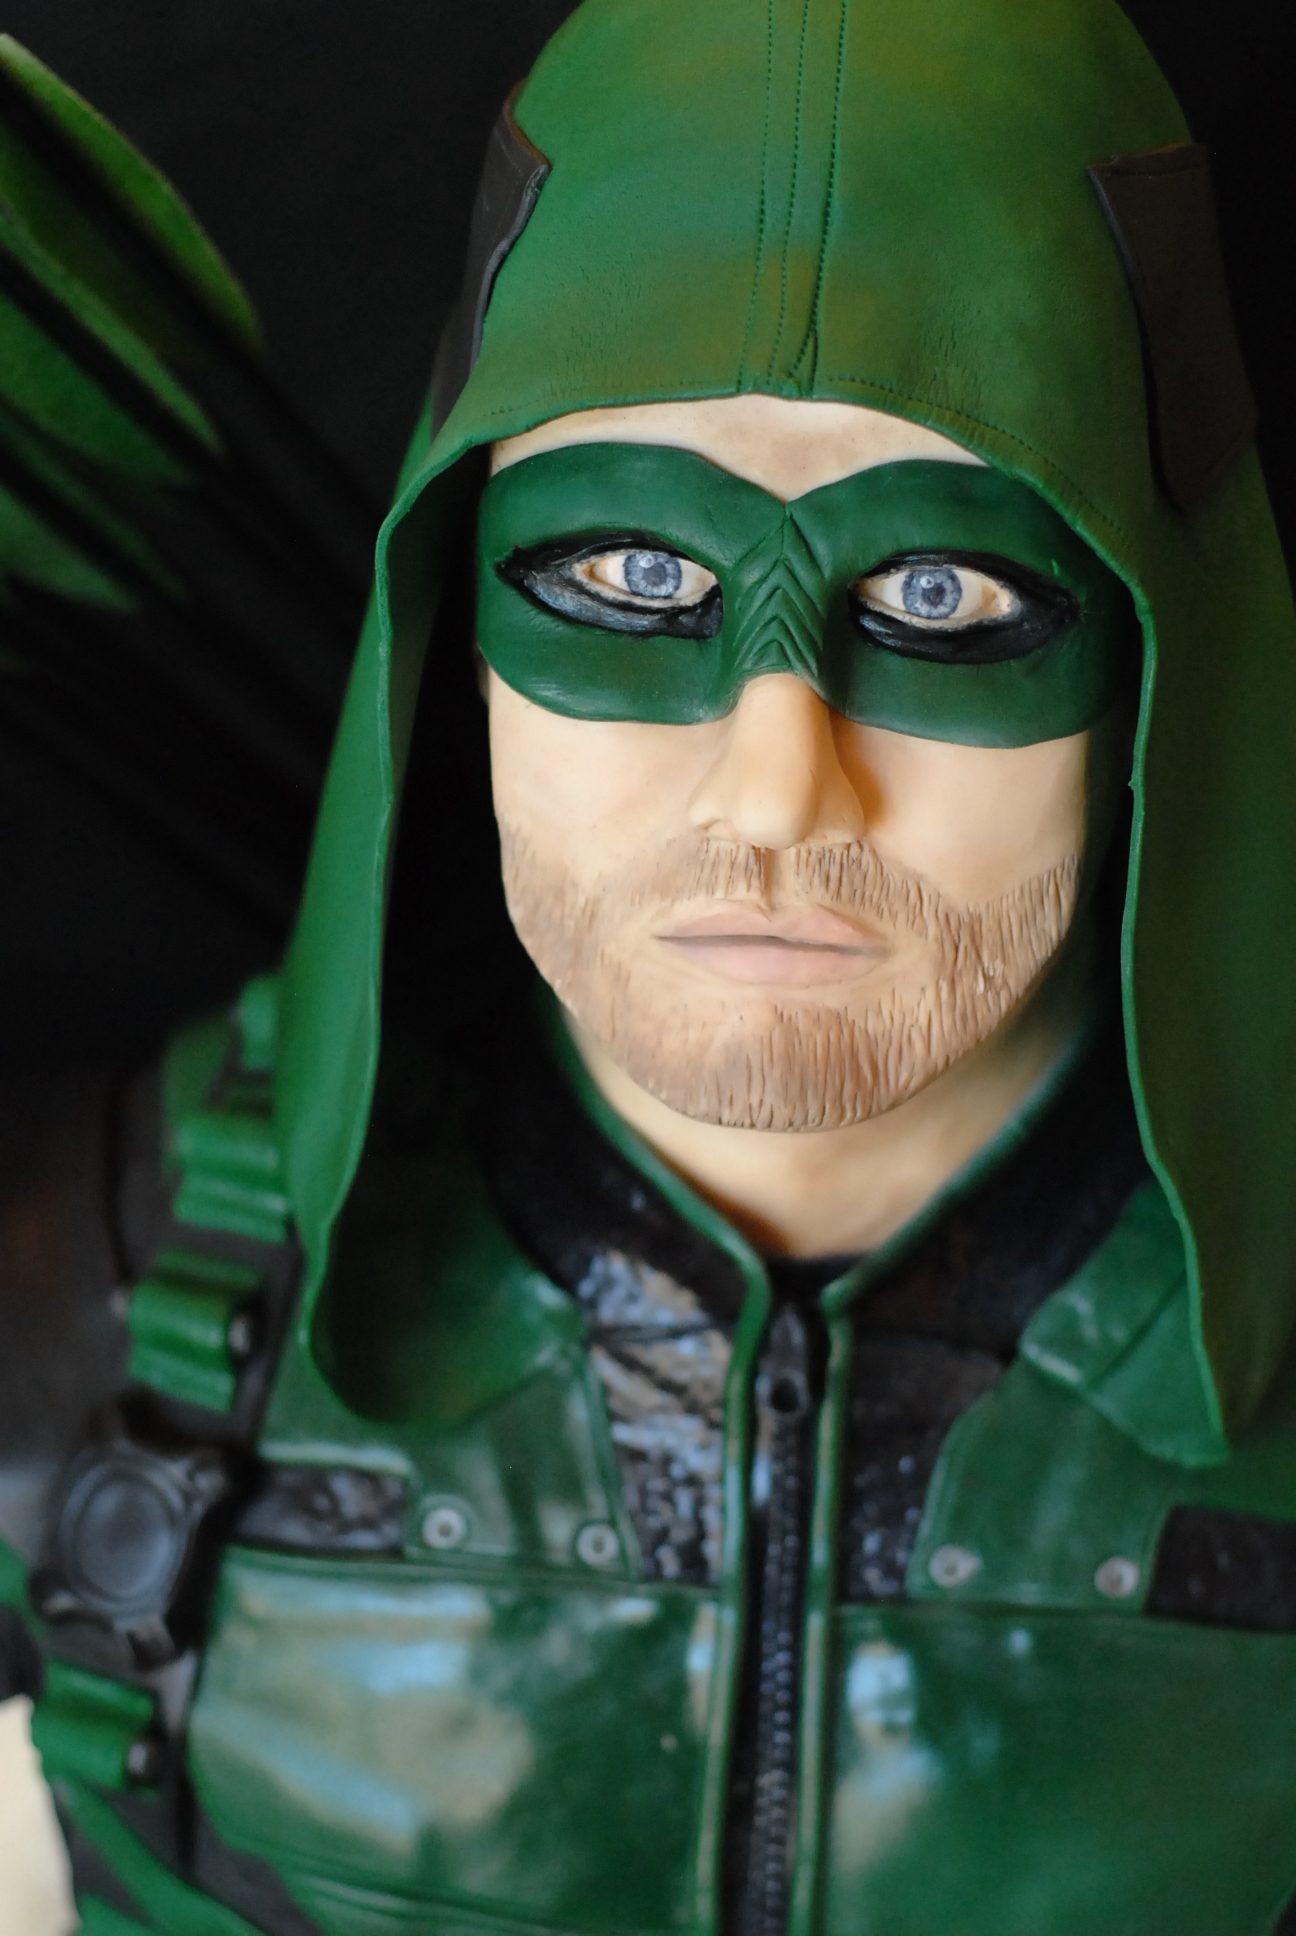 Green Arrow Cake, Stephen Amell Cake, Face Sculpting, modeling chocolate face, Green Arrow, Arrow